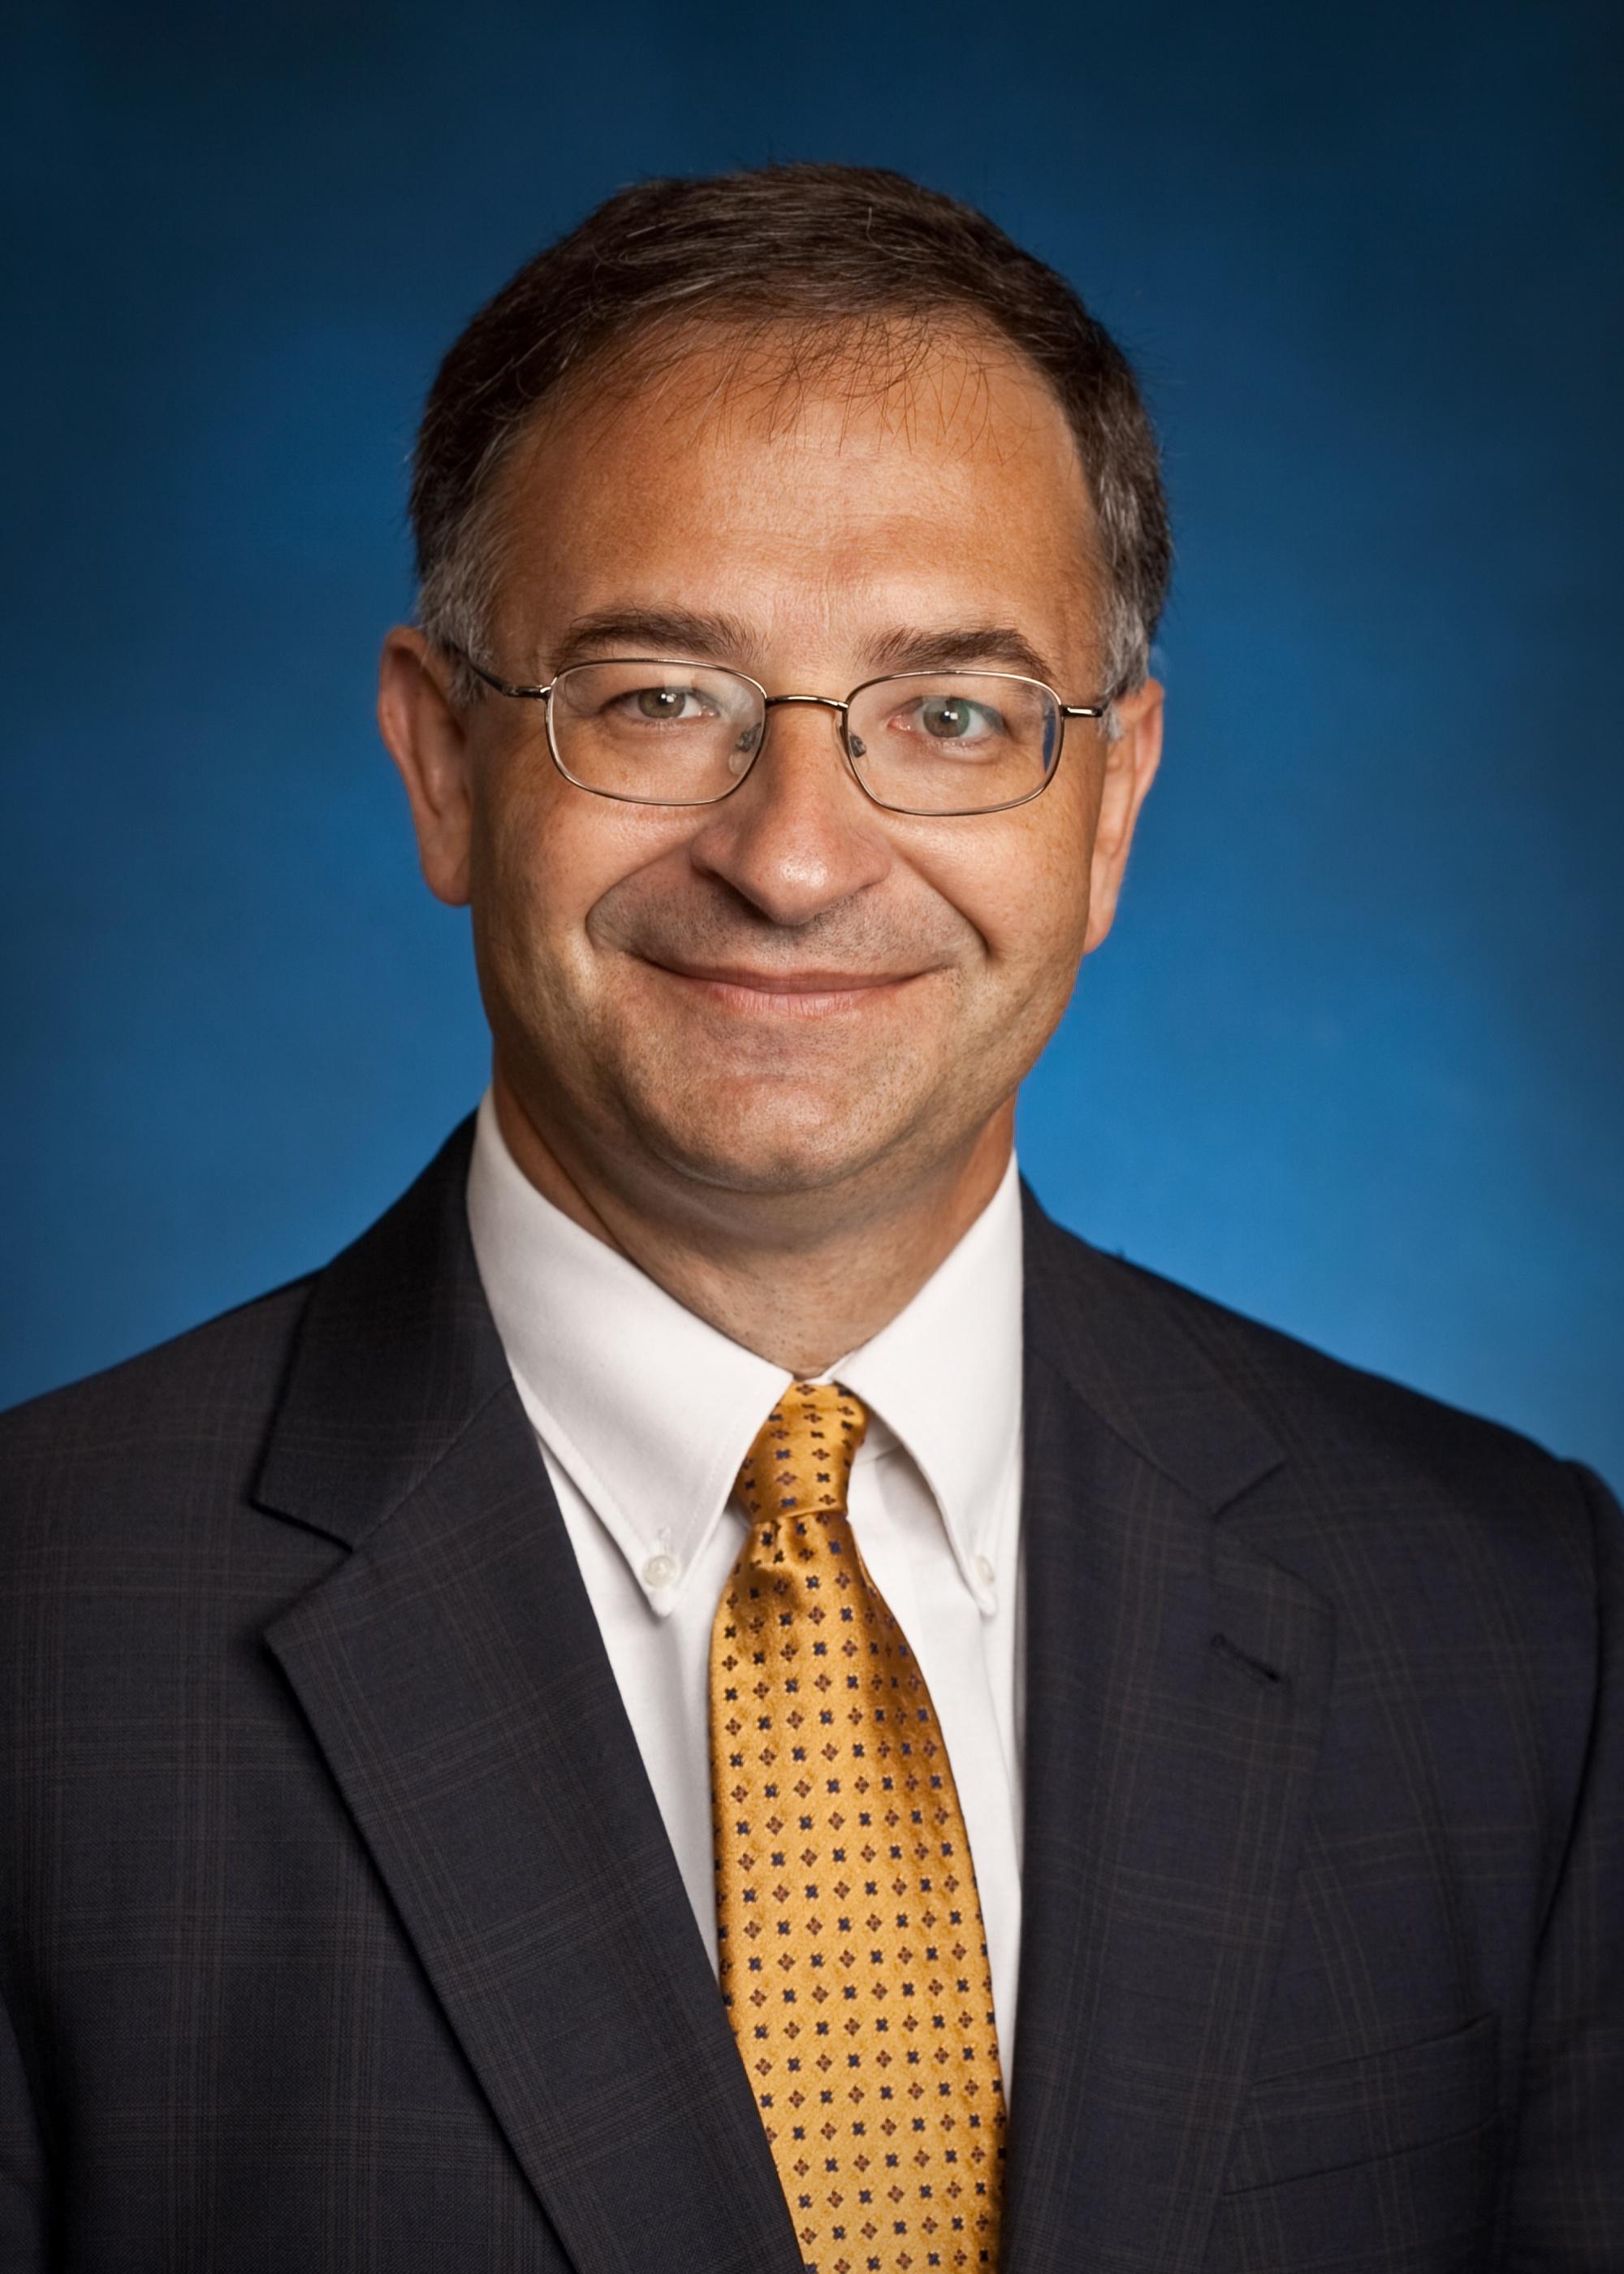 John Crum | CEO & President of Seaman Corporation